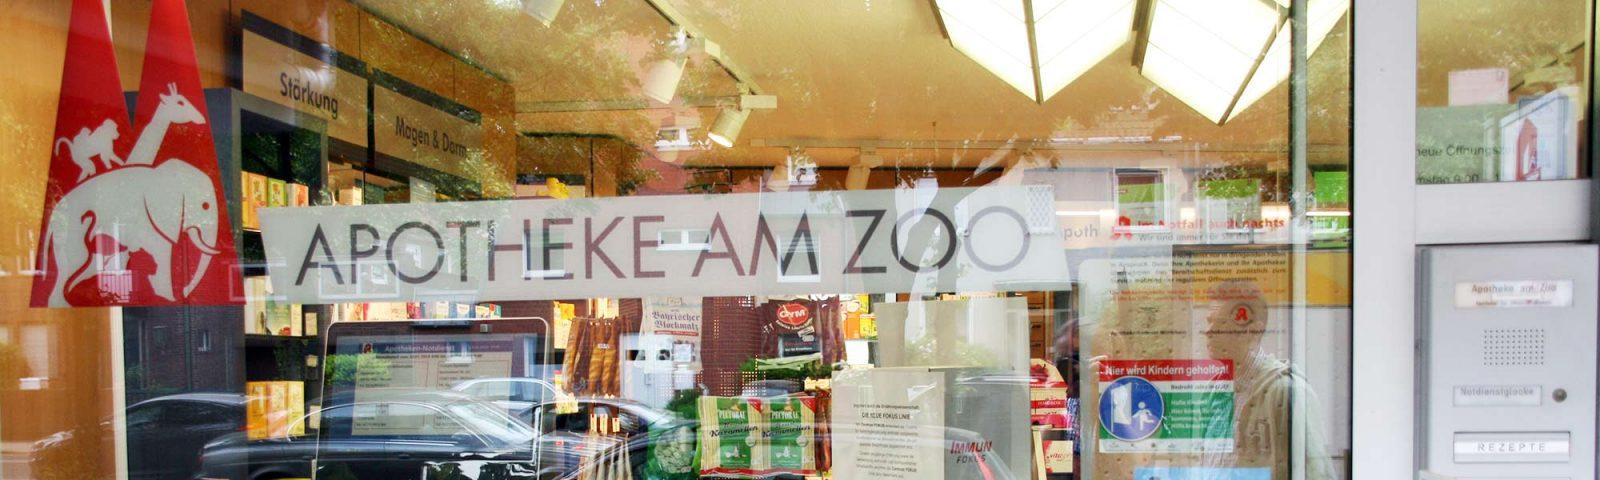 Apotheke am Zoo, Köln